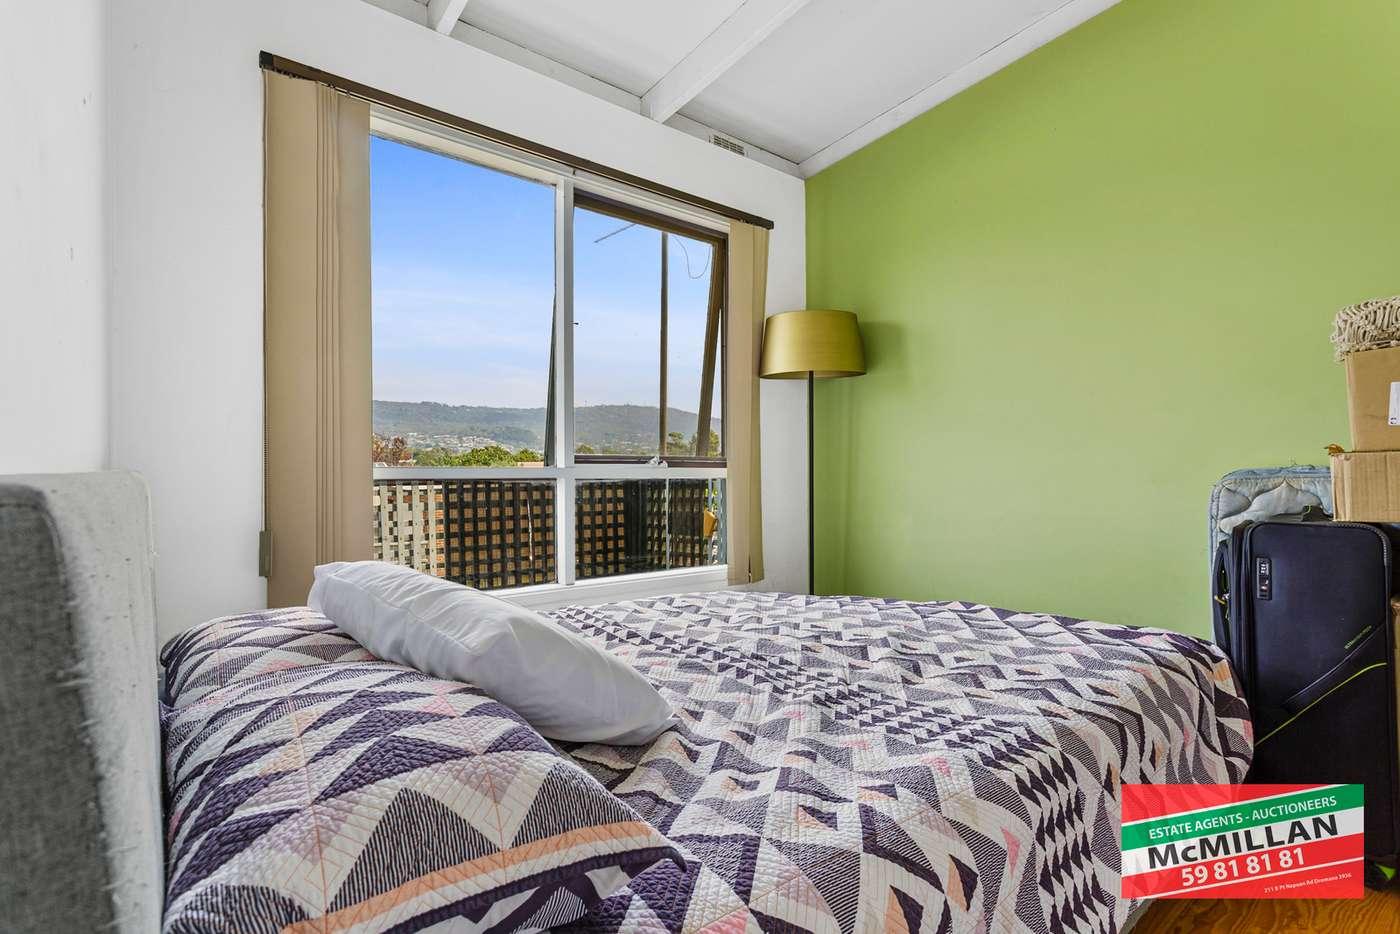 Seventh view of Homely house listing, 2 Beachurst Avenue, Dromana VIC 3936